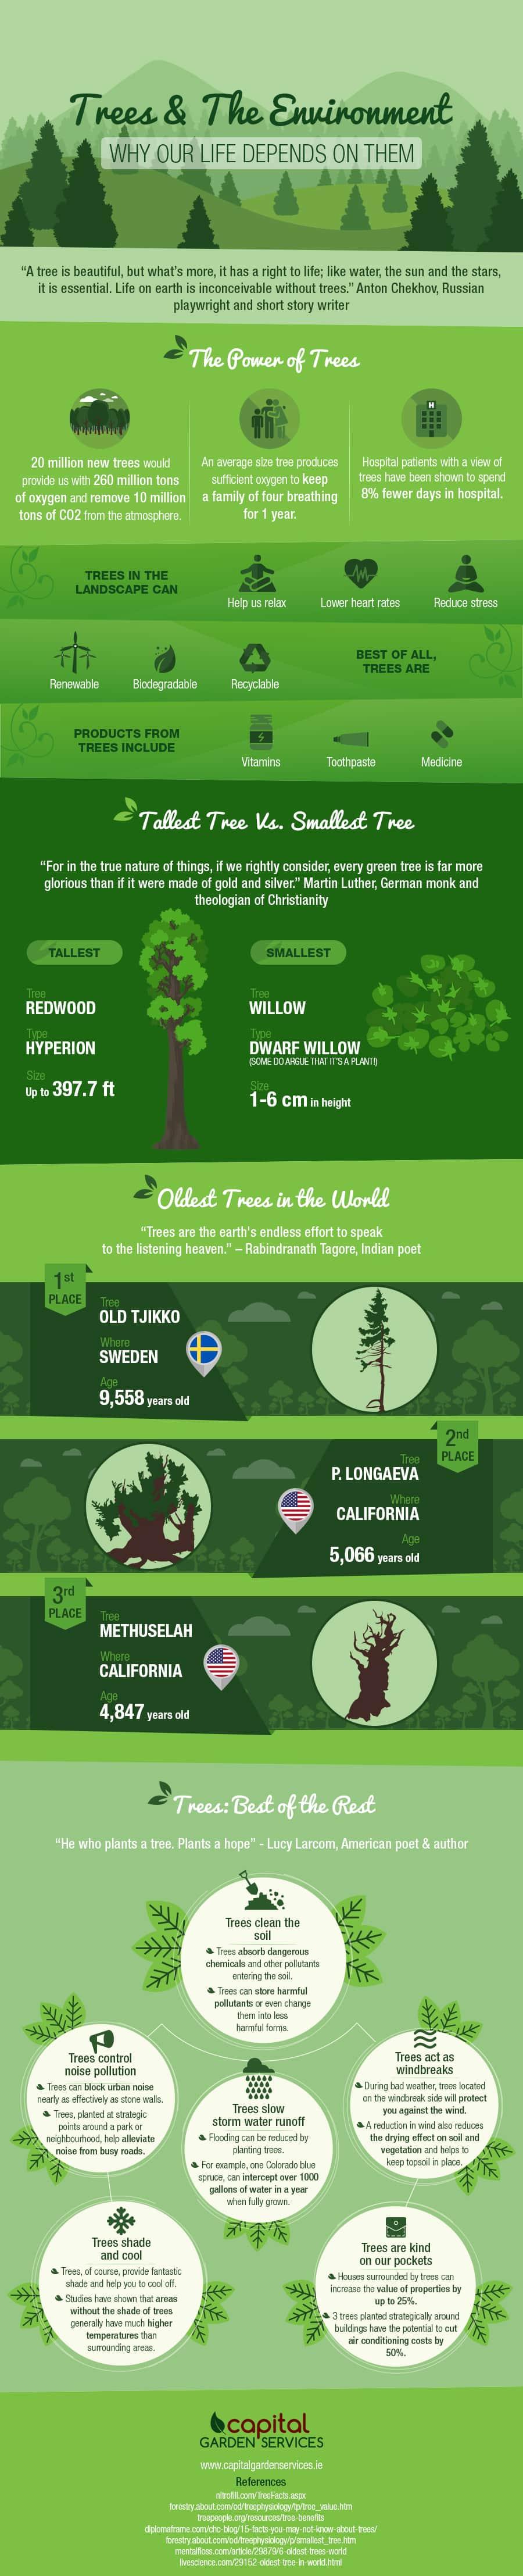 trees environment infographic